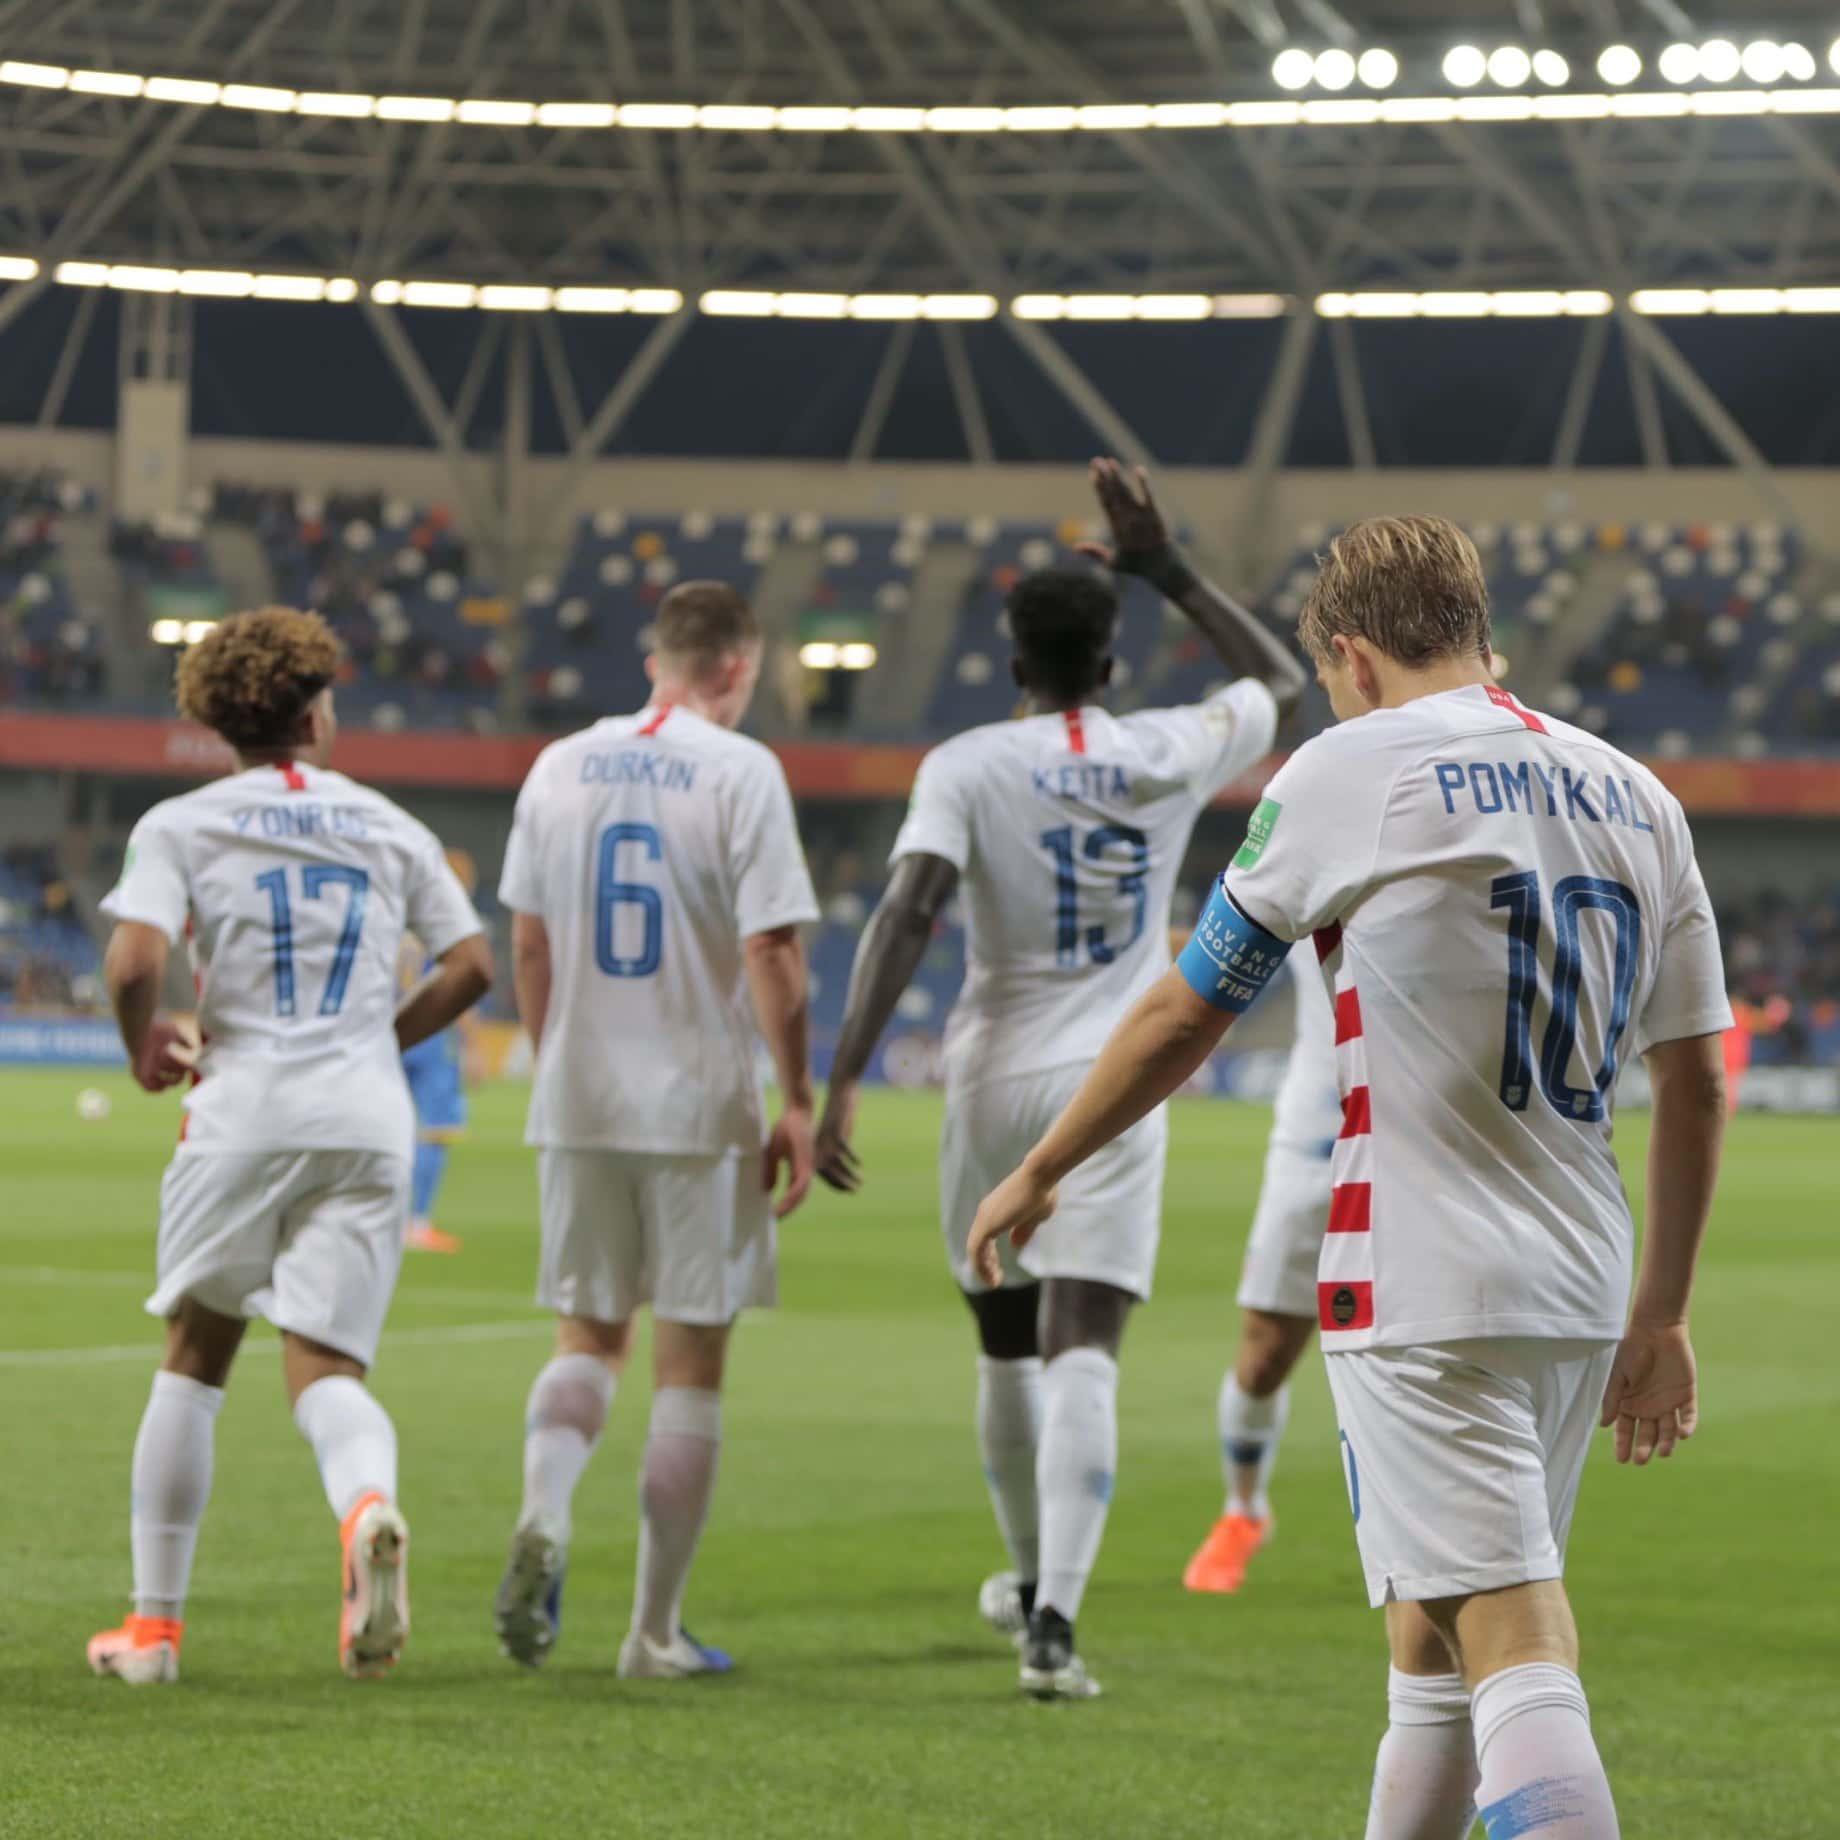 b44ba16c175 USA Drops 2019 U-20 World Cup Opener to Ukraine 2-1